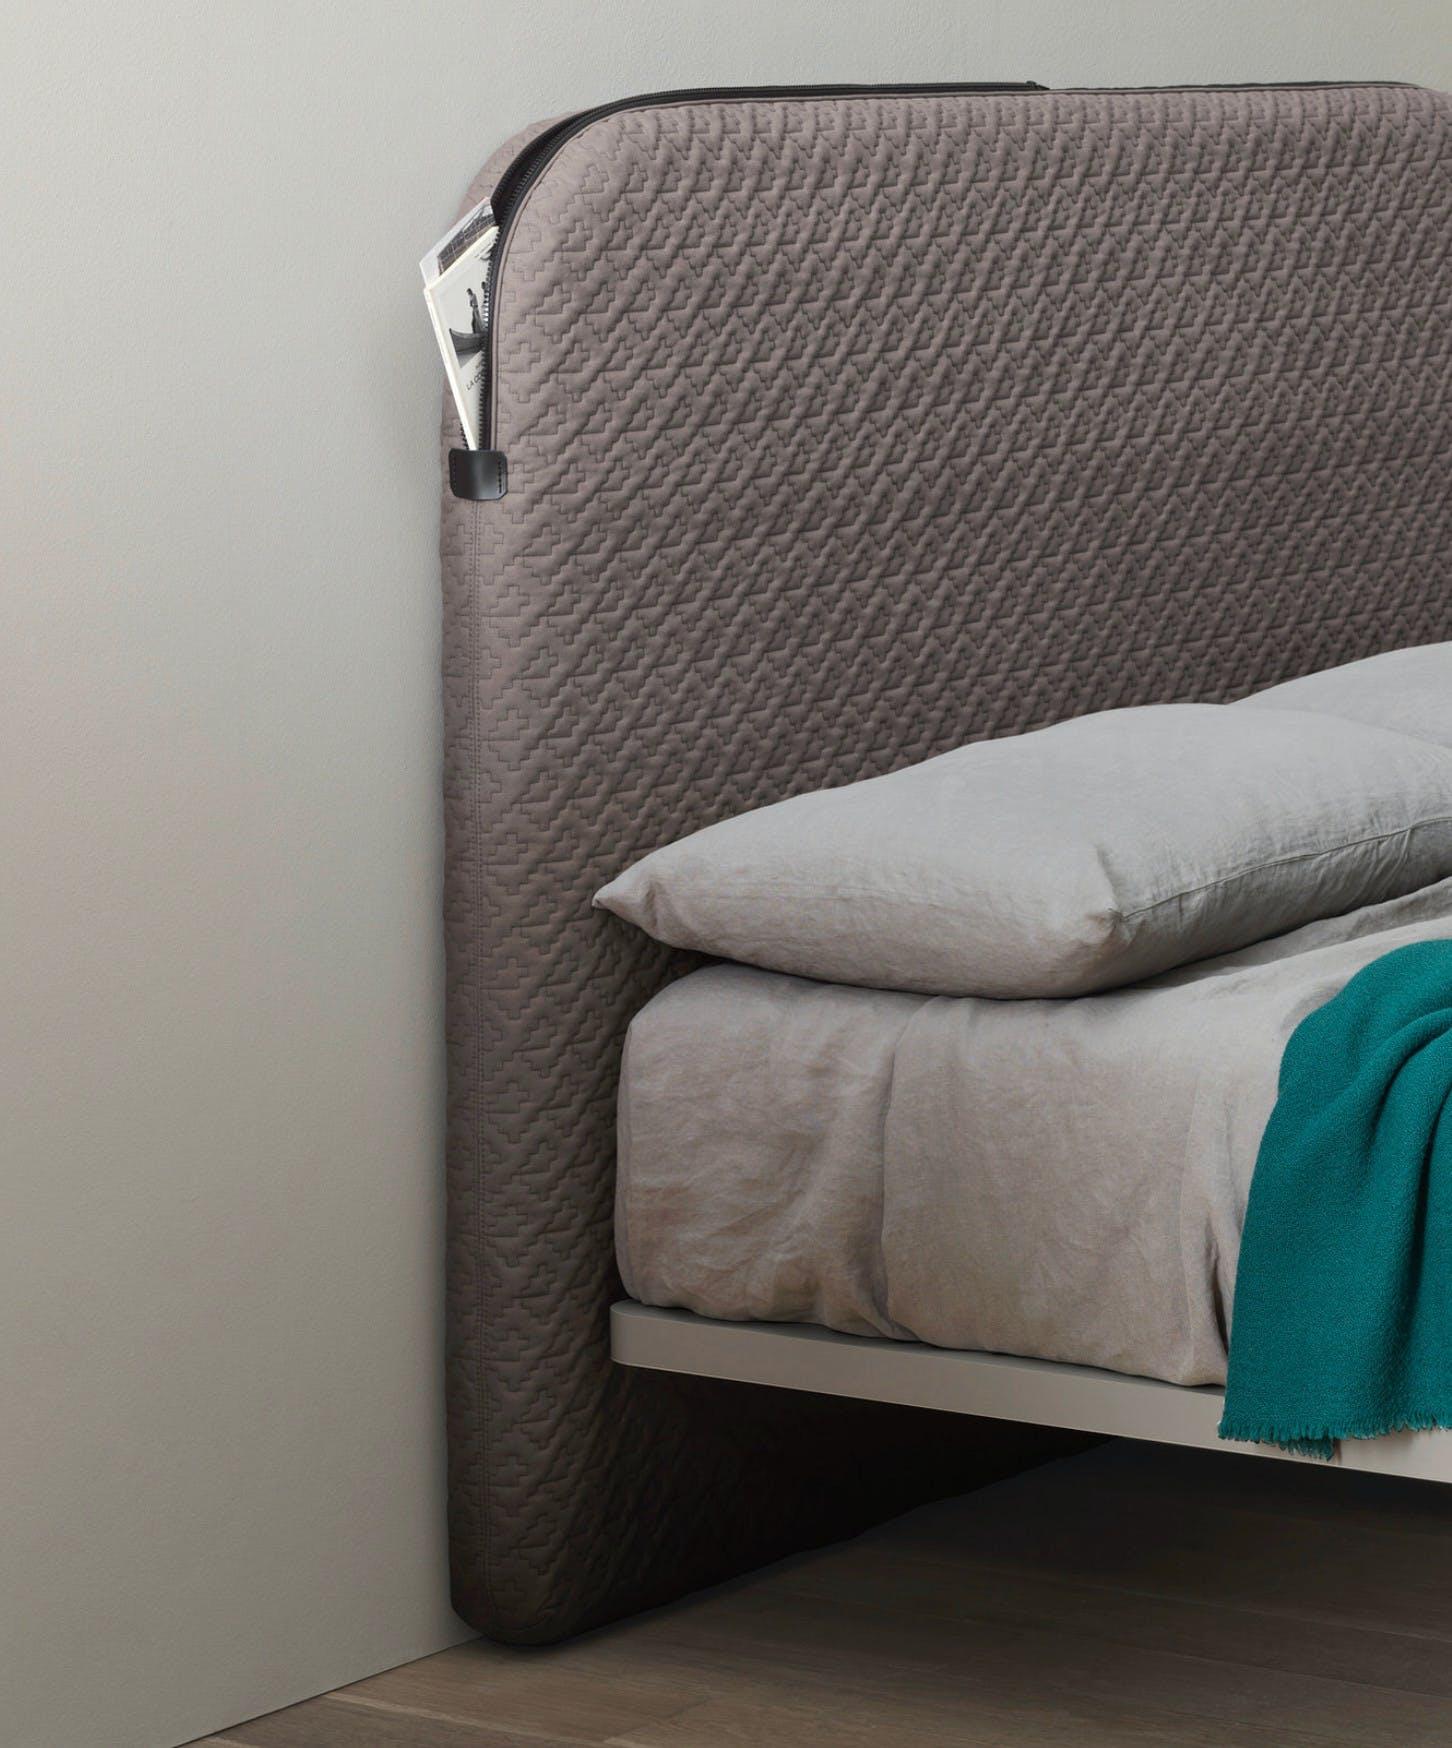 Caccaro Bagtune Bed Headboard Haute Living